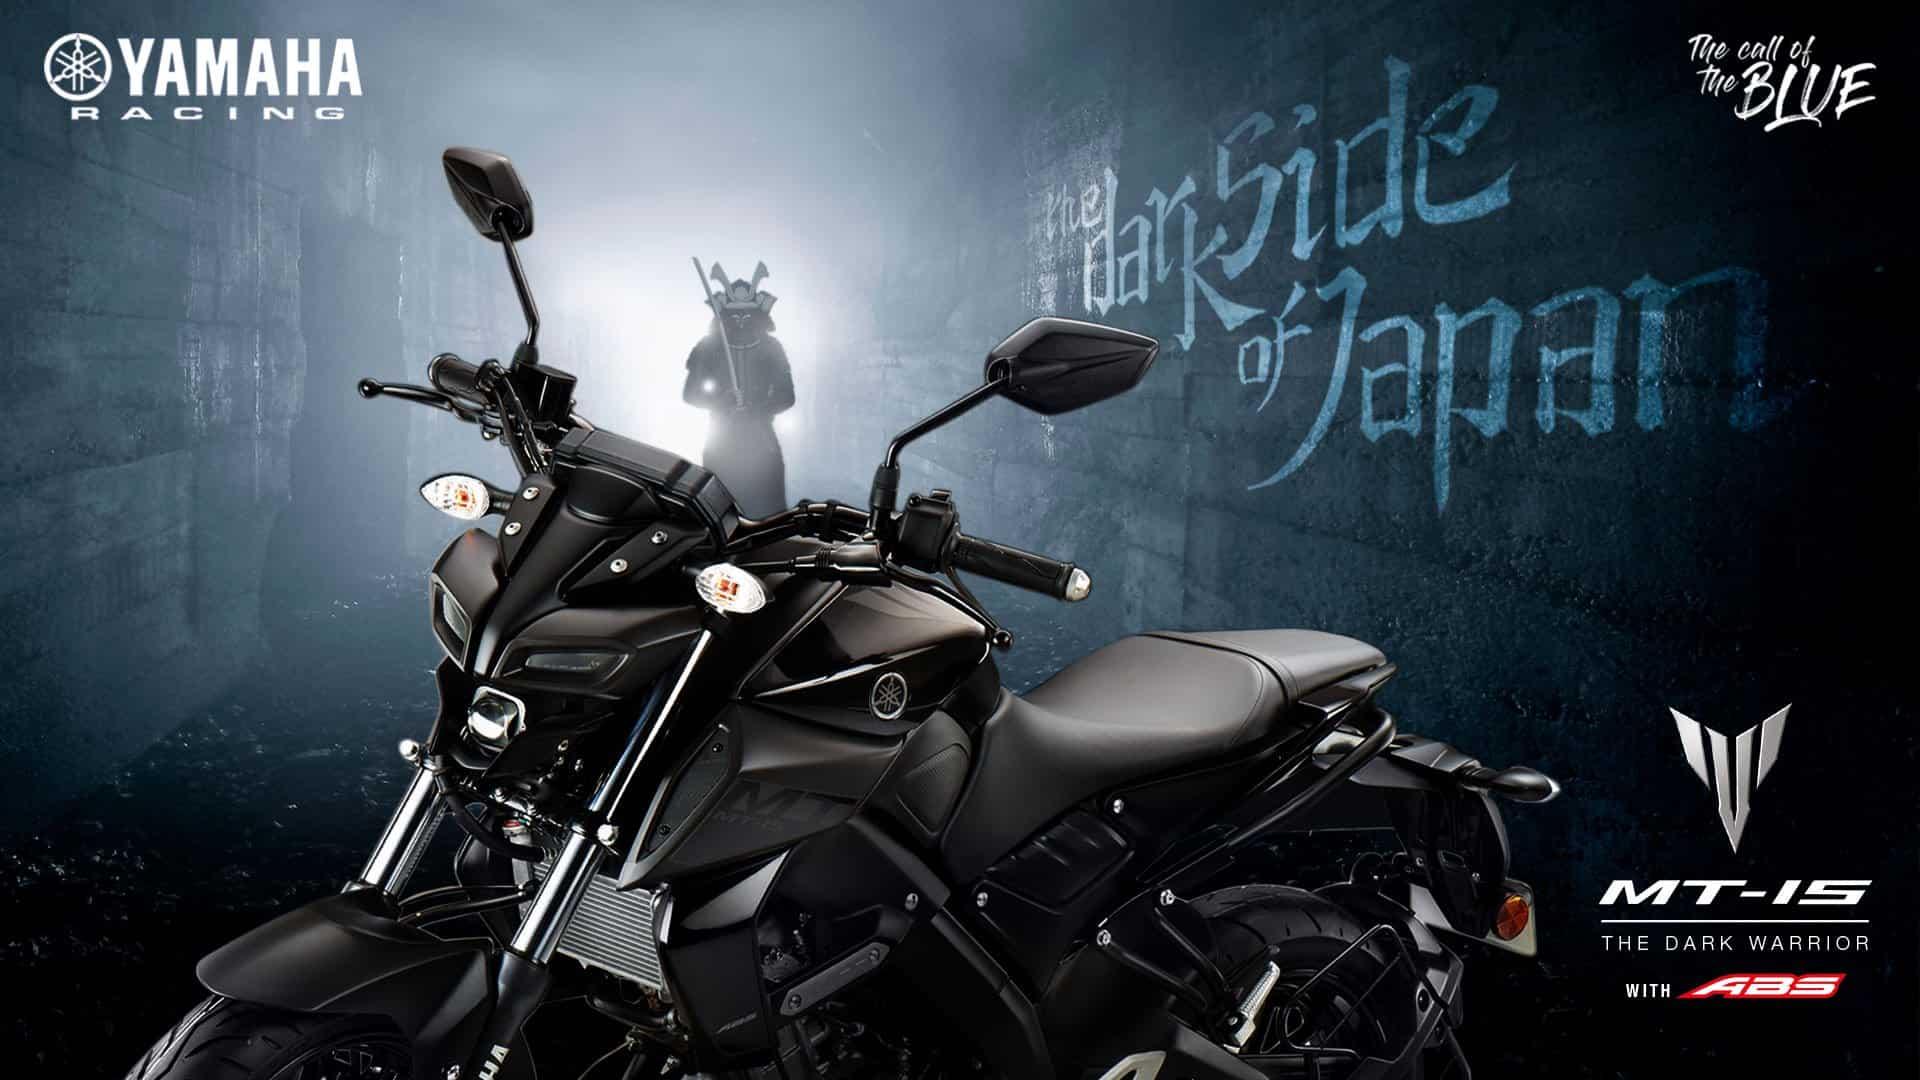 1.Dynamic Hypermotard-style bike